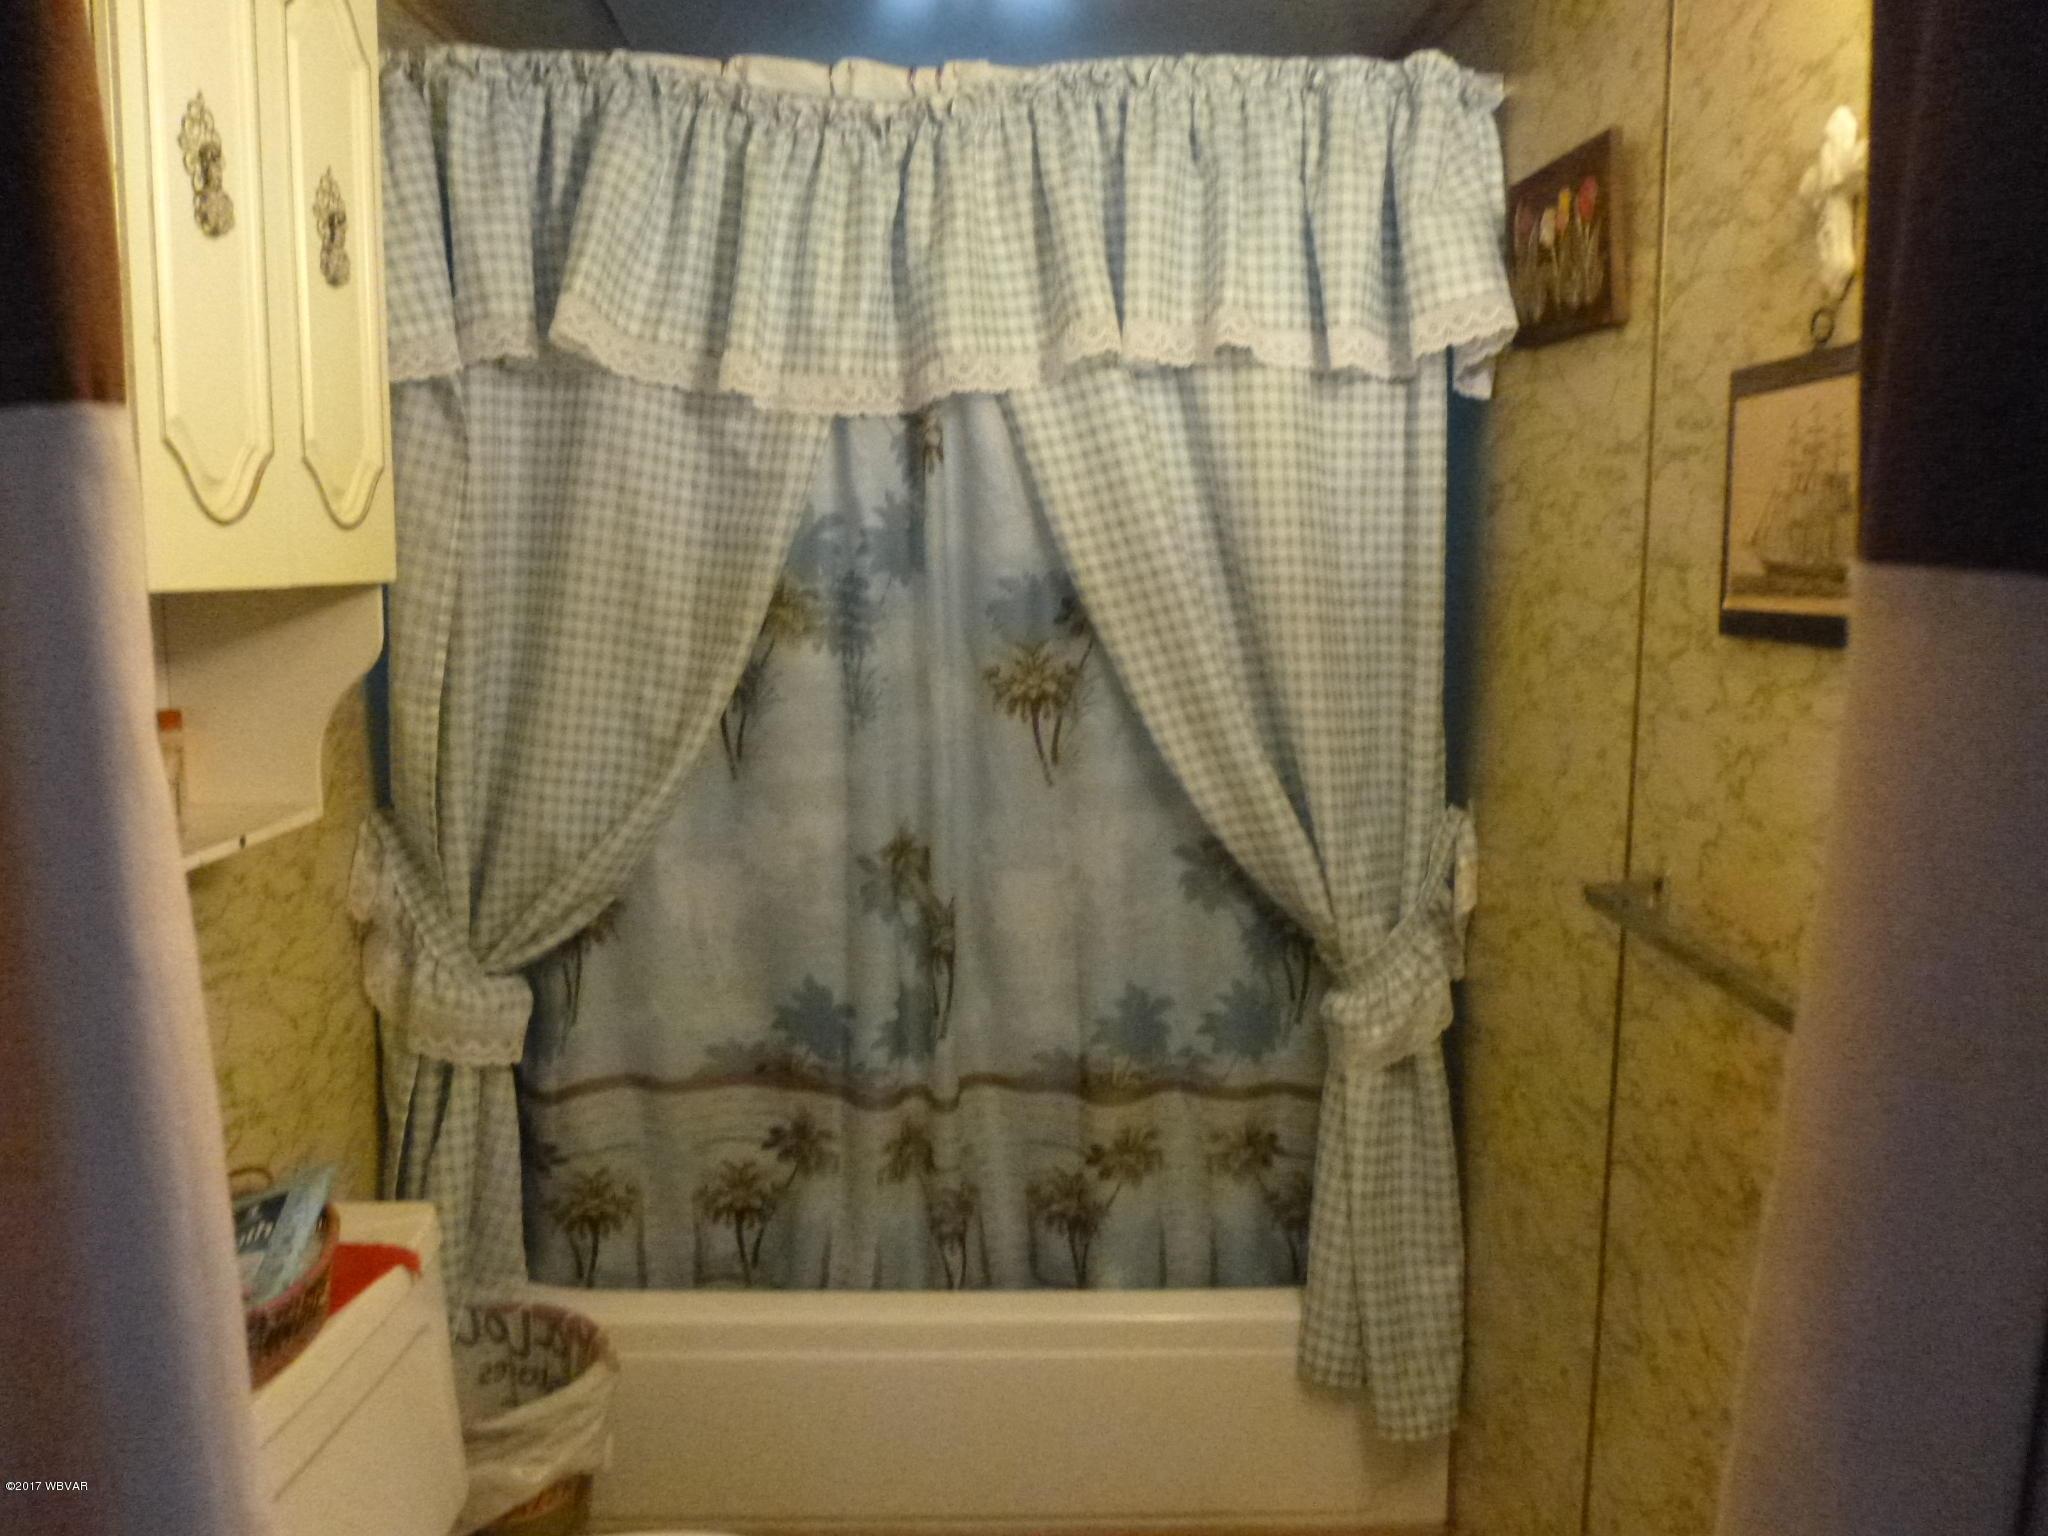 218 CLINTON STREET, Renovo, PA 17764, 2 Bedrooms Bedrooms, ,2 BathroomsBathrooms,Residential,For sale,CLINTON,WB-82017